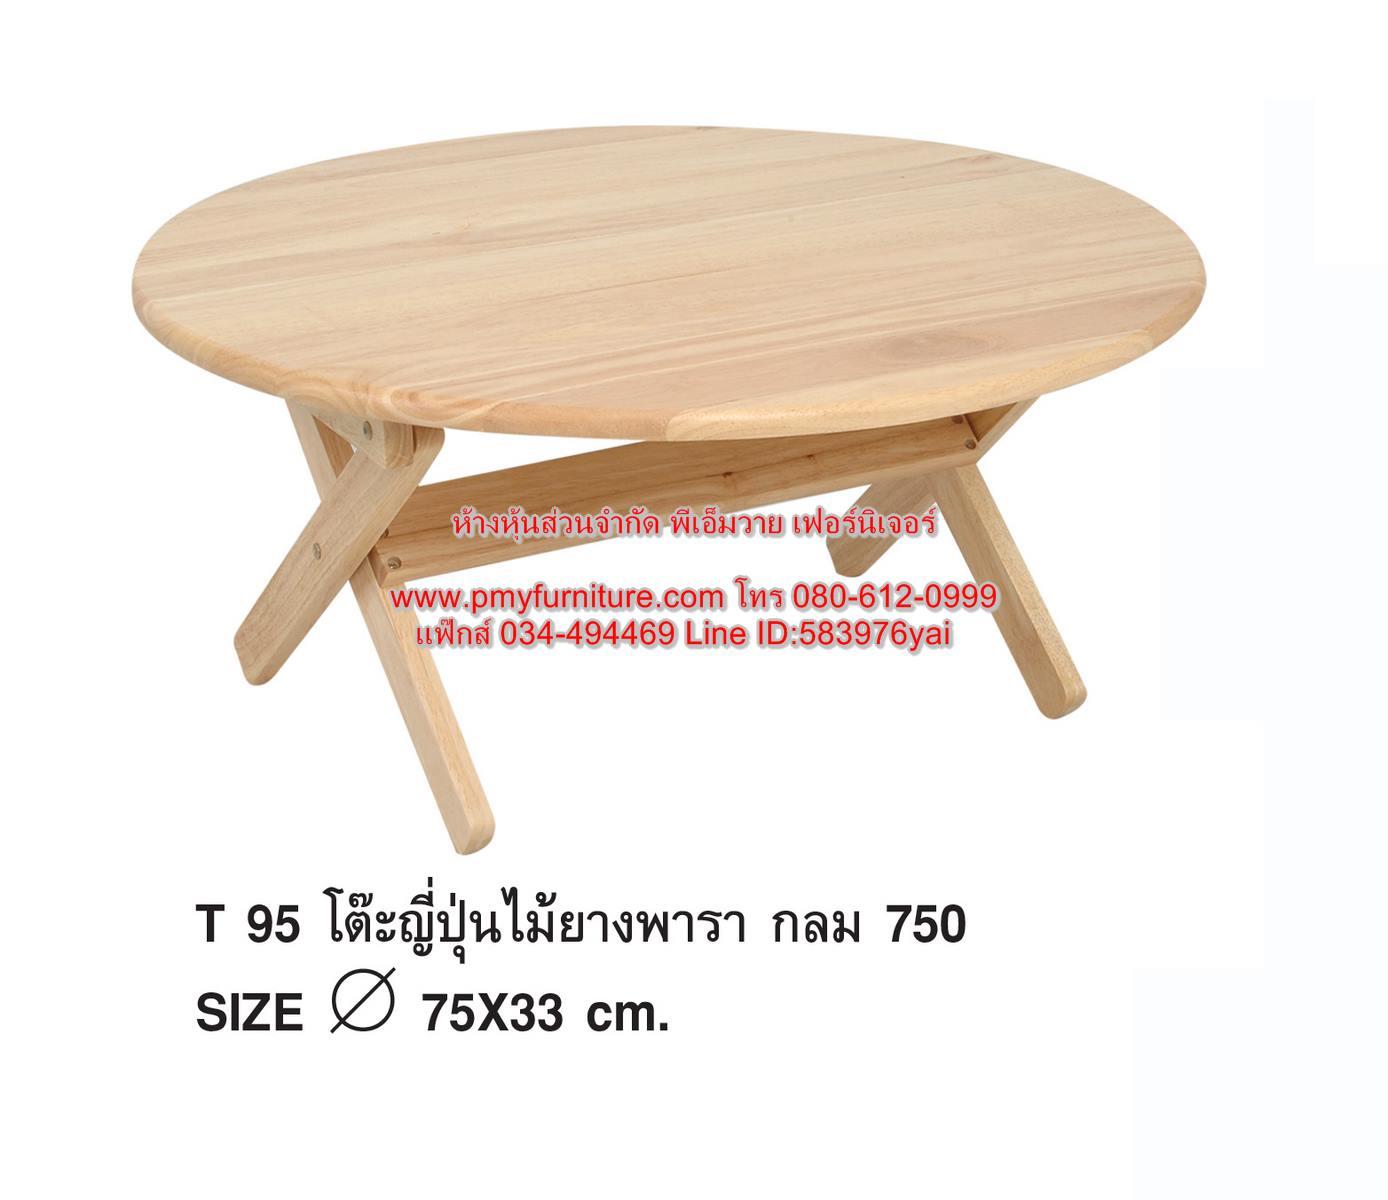 PMY24-1 โต๊ะญี่ปุ่นกลม ไม้ยางพารา ขนาด 75 ซม.